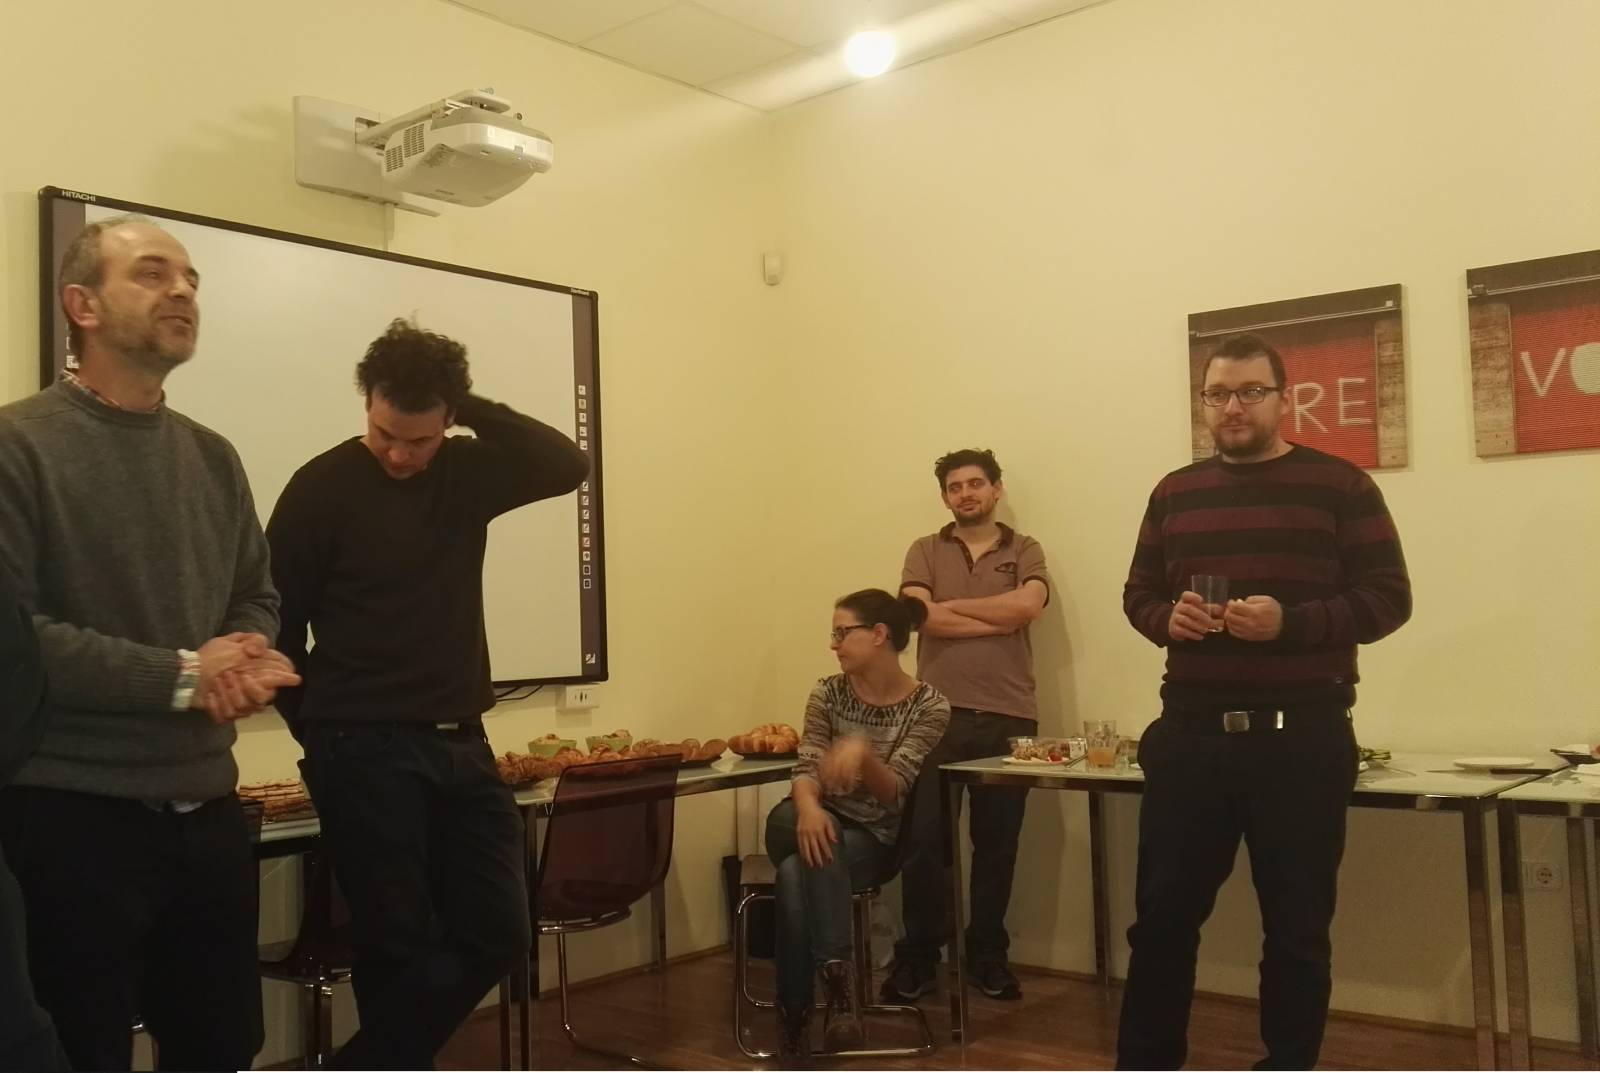 Mircea Cernov, Tordai Bence, Pál Bori, Neumann Péter